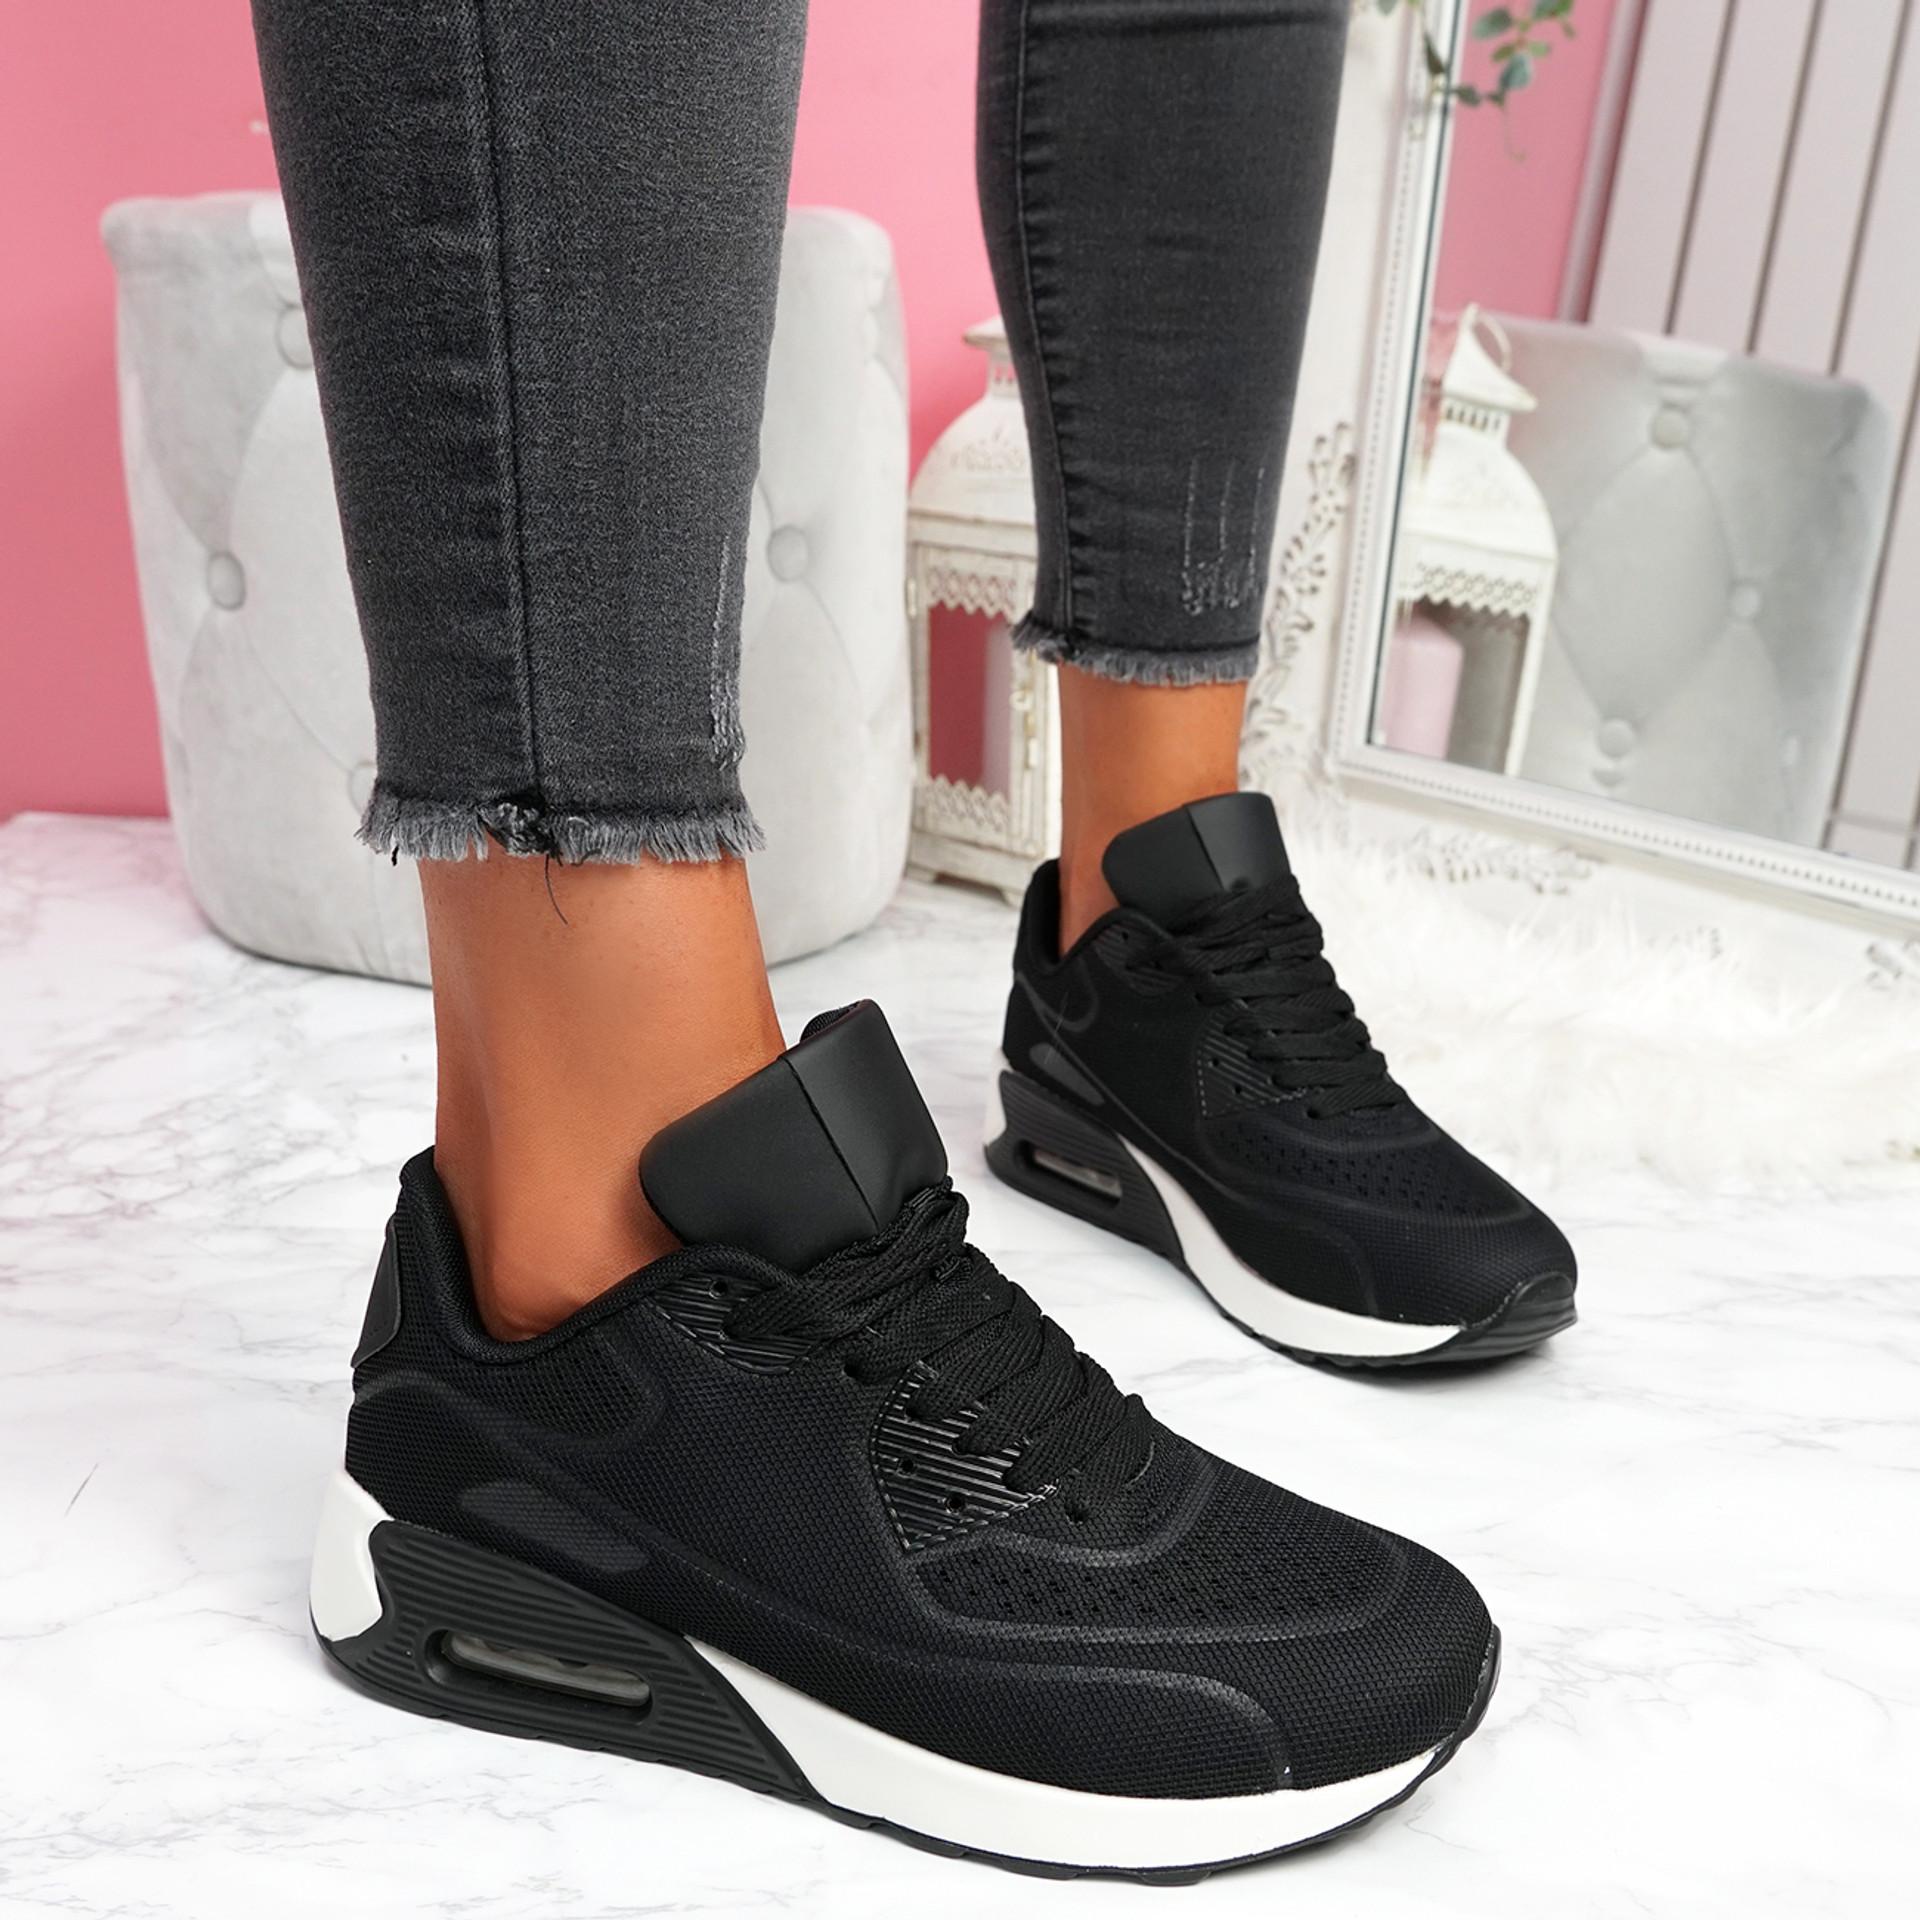 Geppy Black White Fashion Trainers